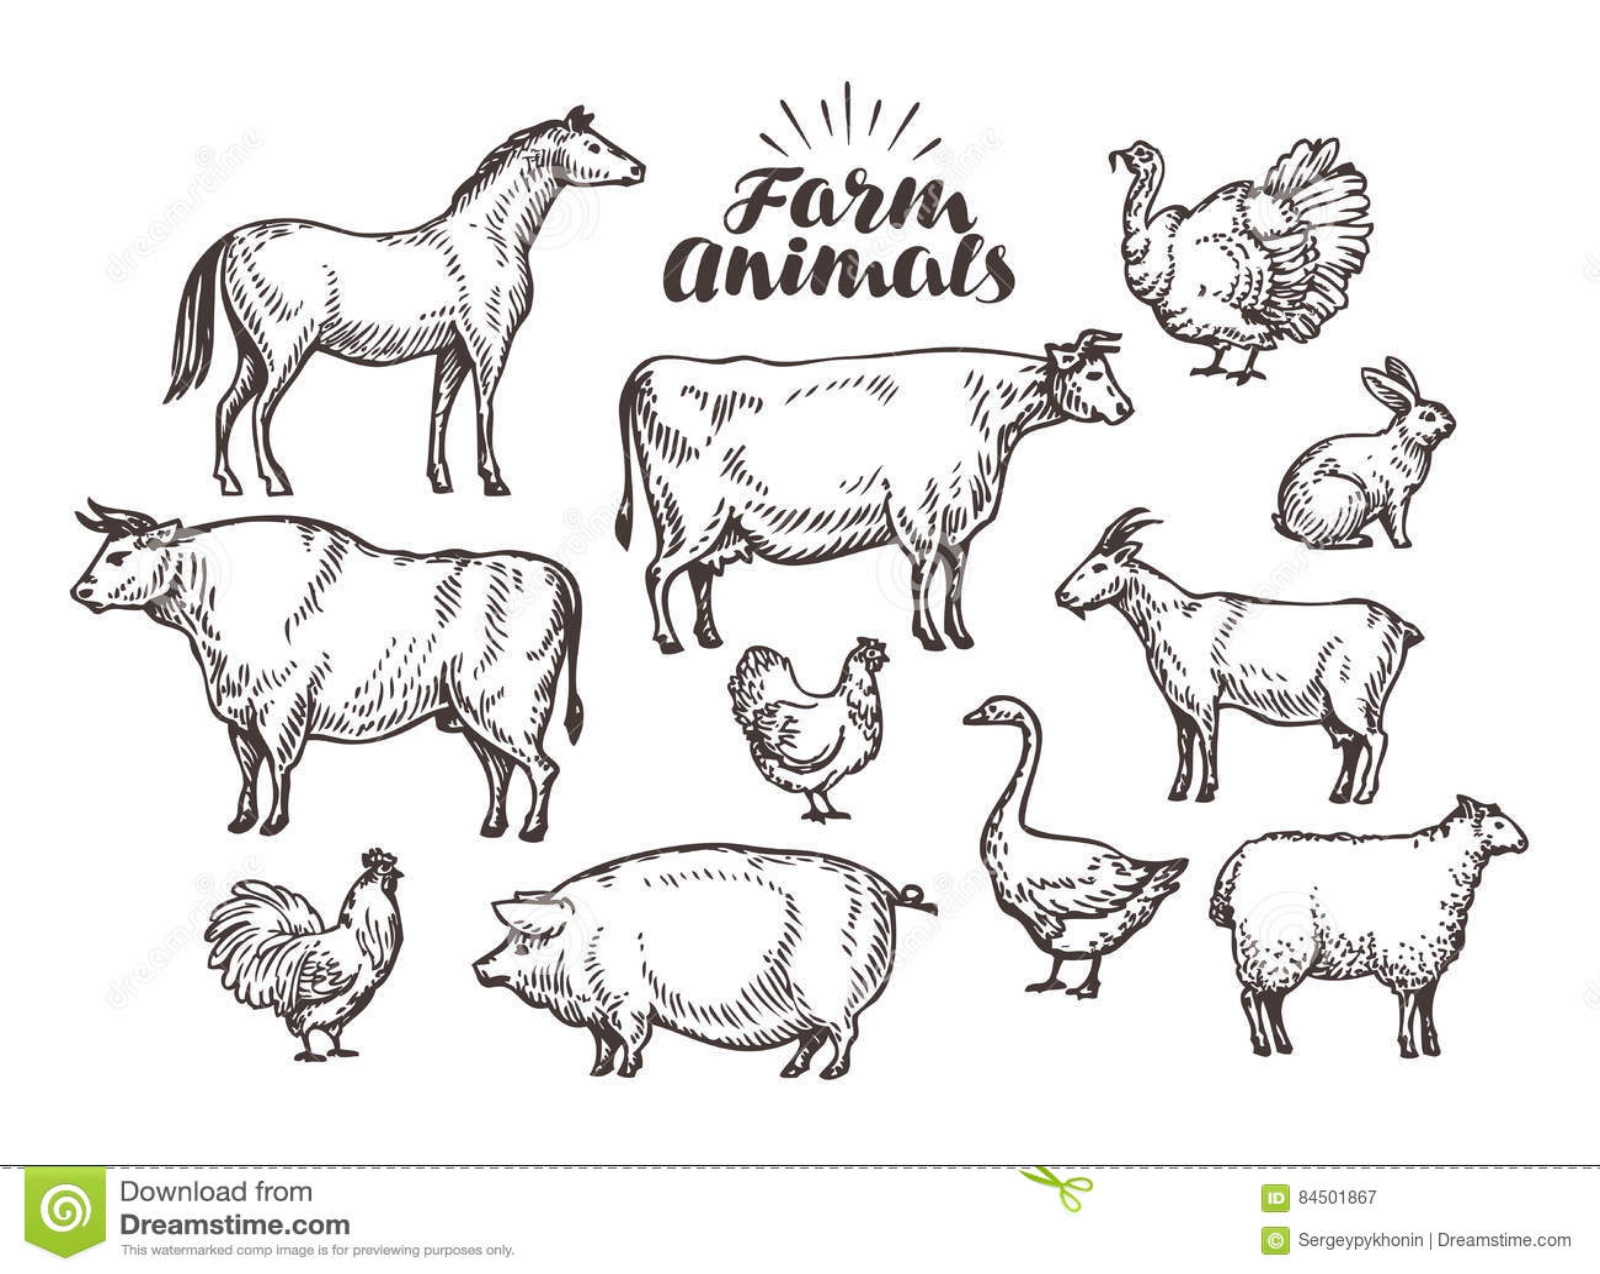 Farm Vector Sketch Collection Animals Such As Horse Cow